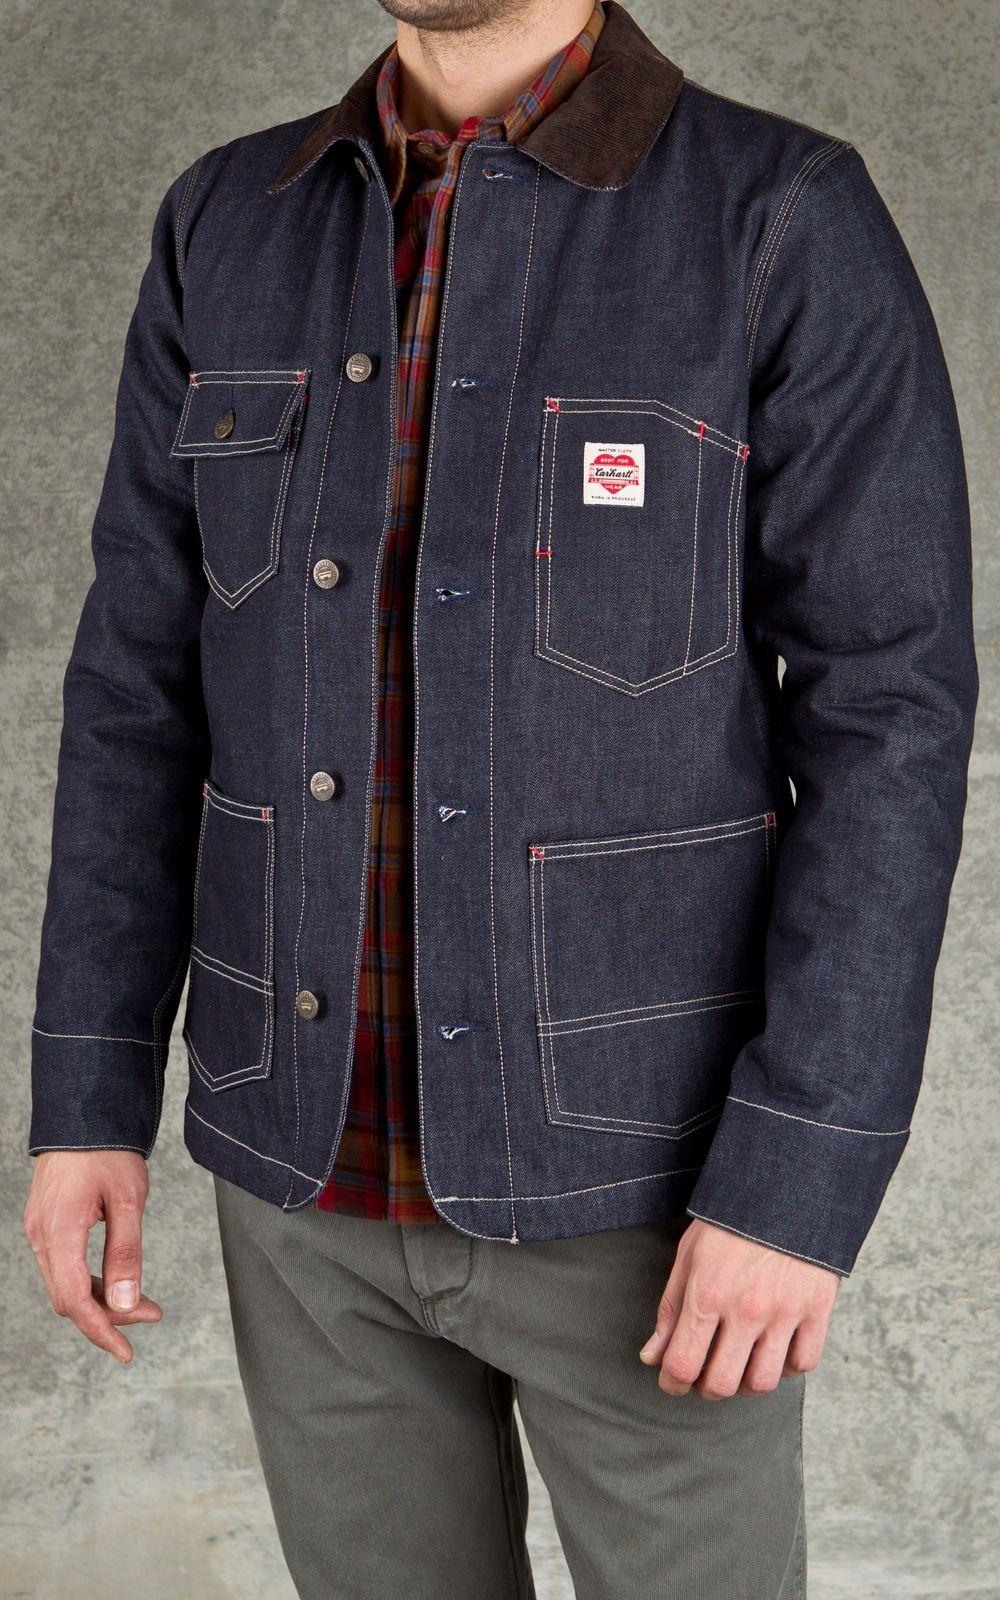 Carhartt State Coat Blue Solch Eine Jeansjacke Wurde Sogar Ich Anziehen Denim Jacket Men Men Casual Mens Outfits [ 1600 x 1000 Pixel ]